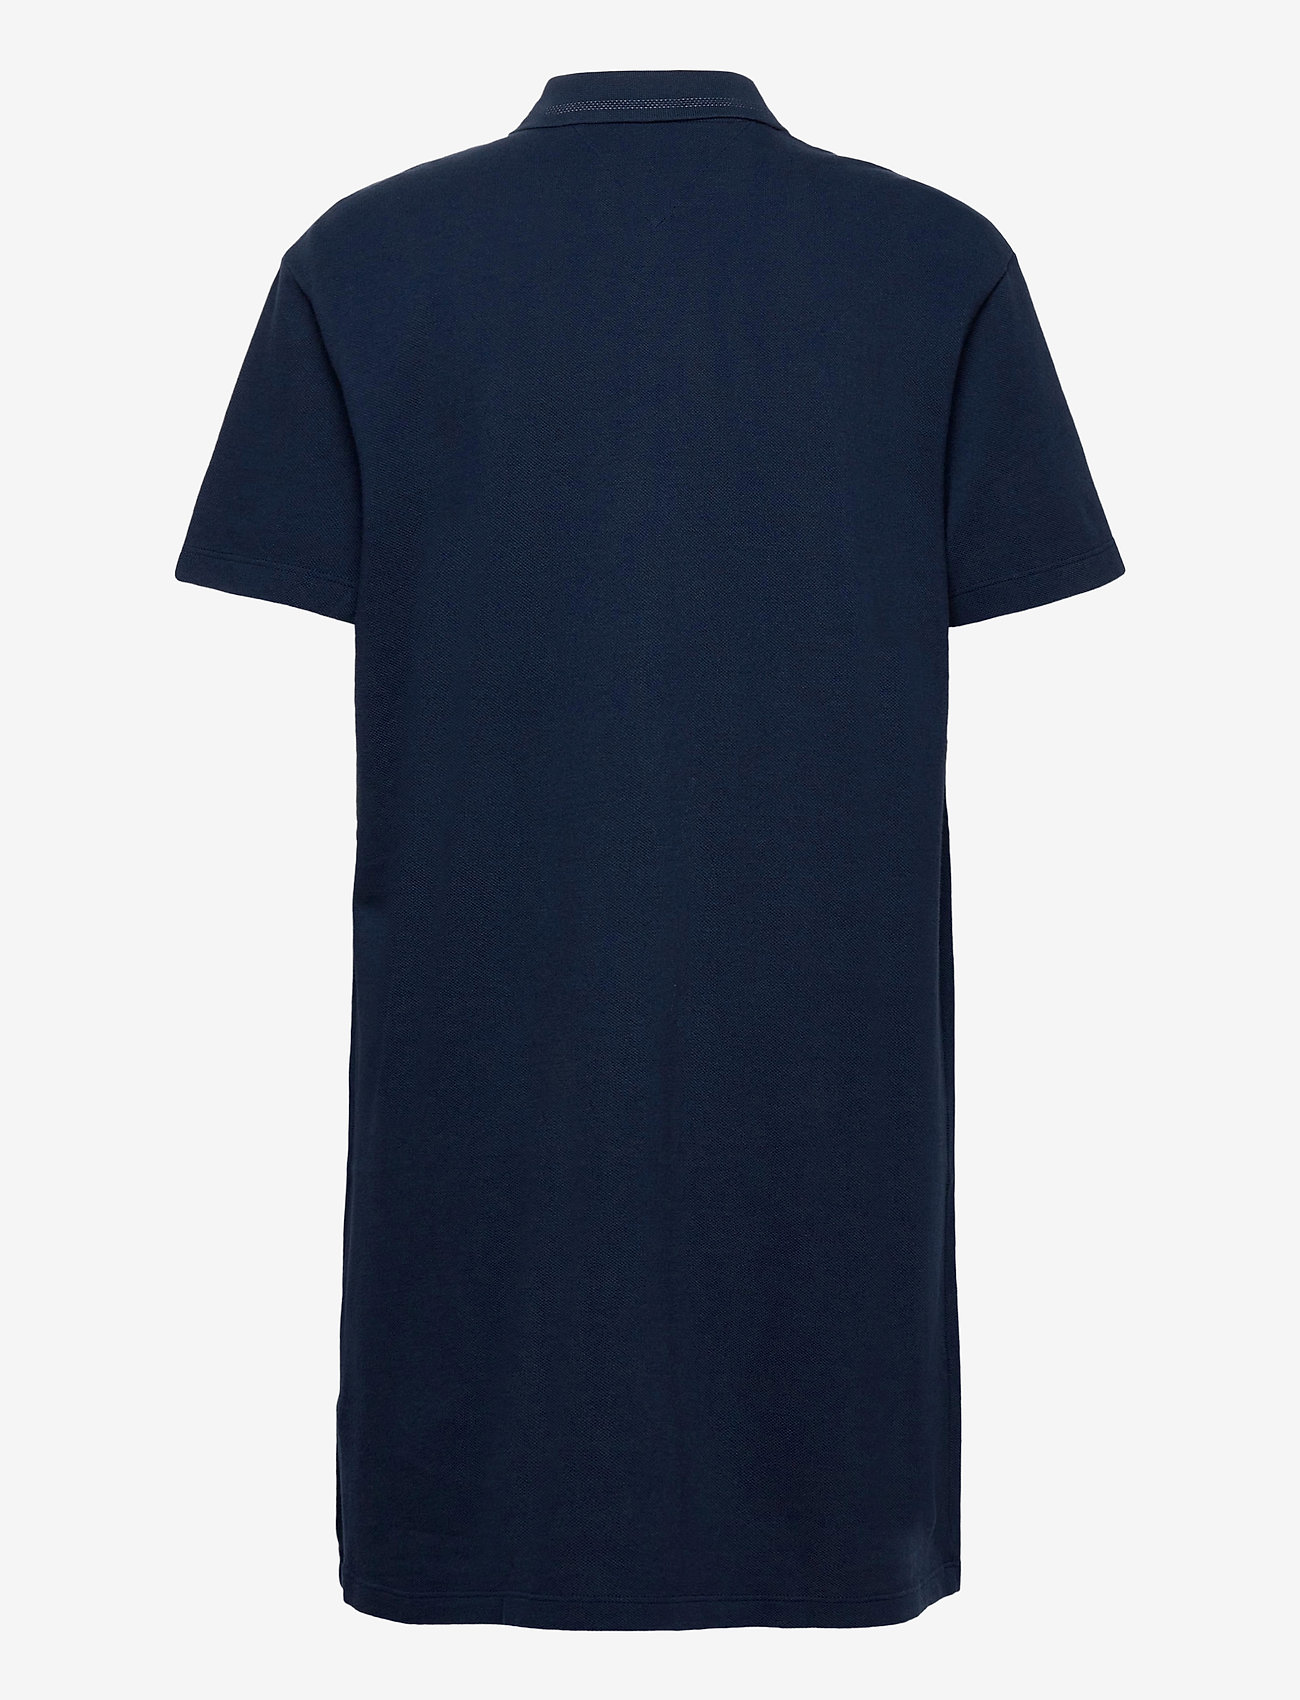 Tommy Jeans - TJW BRANDED COLLAR POLO DRESS - t-shirtklänningar - twilight navy - 1